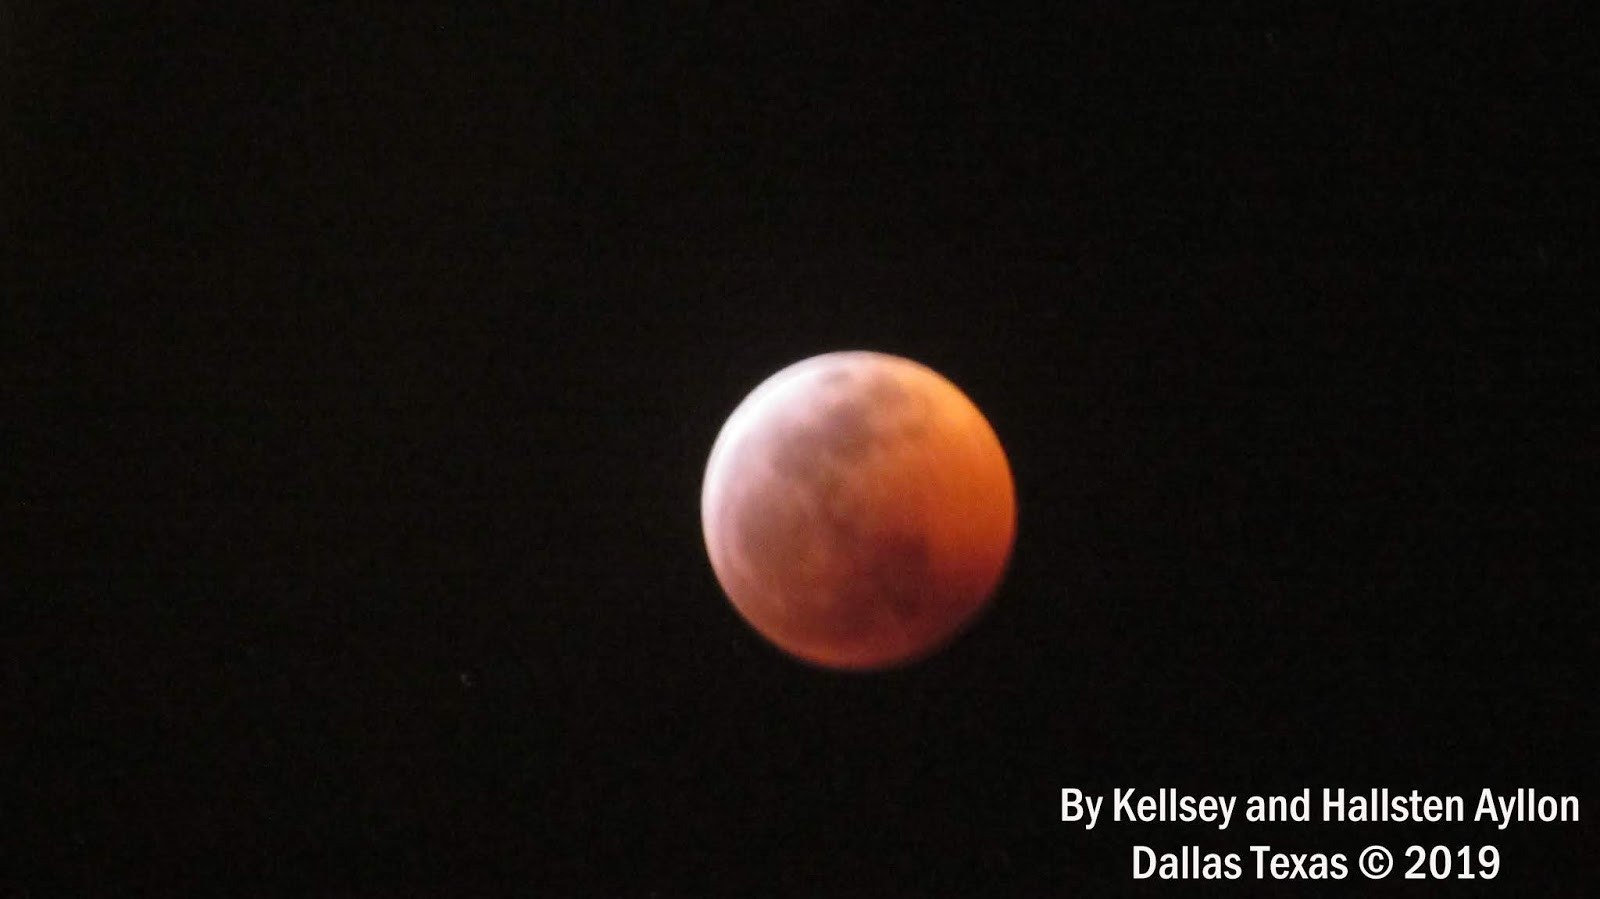 blood moon january 2019 dallas tx - photo #41